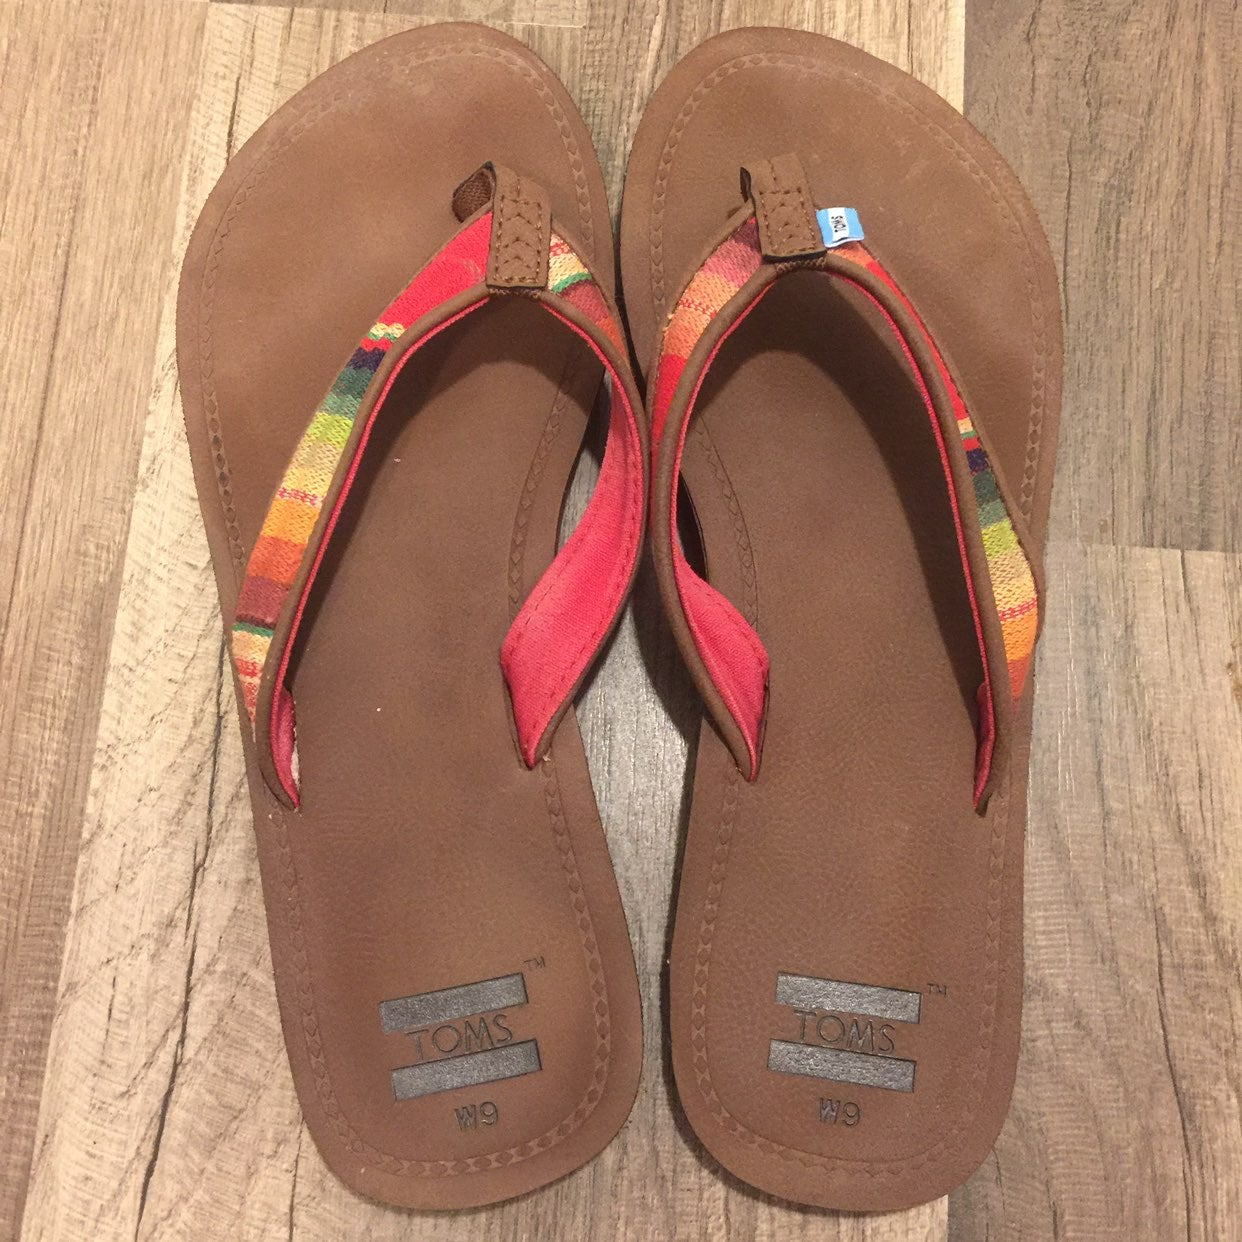 TOMS Sandals Size 9 EUC Worn Very Little